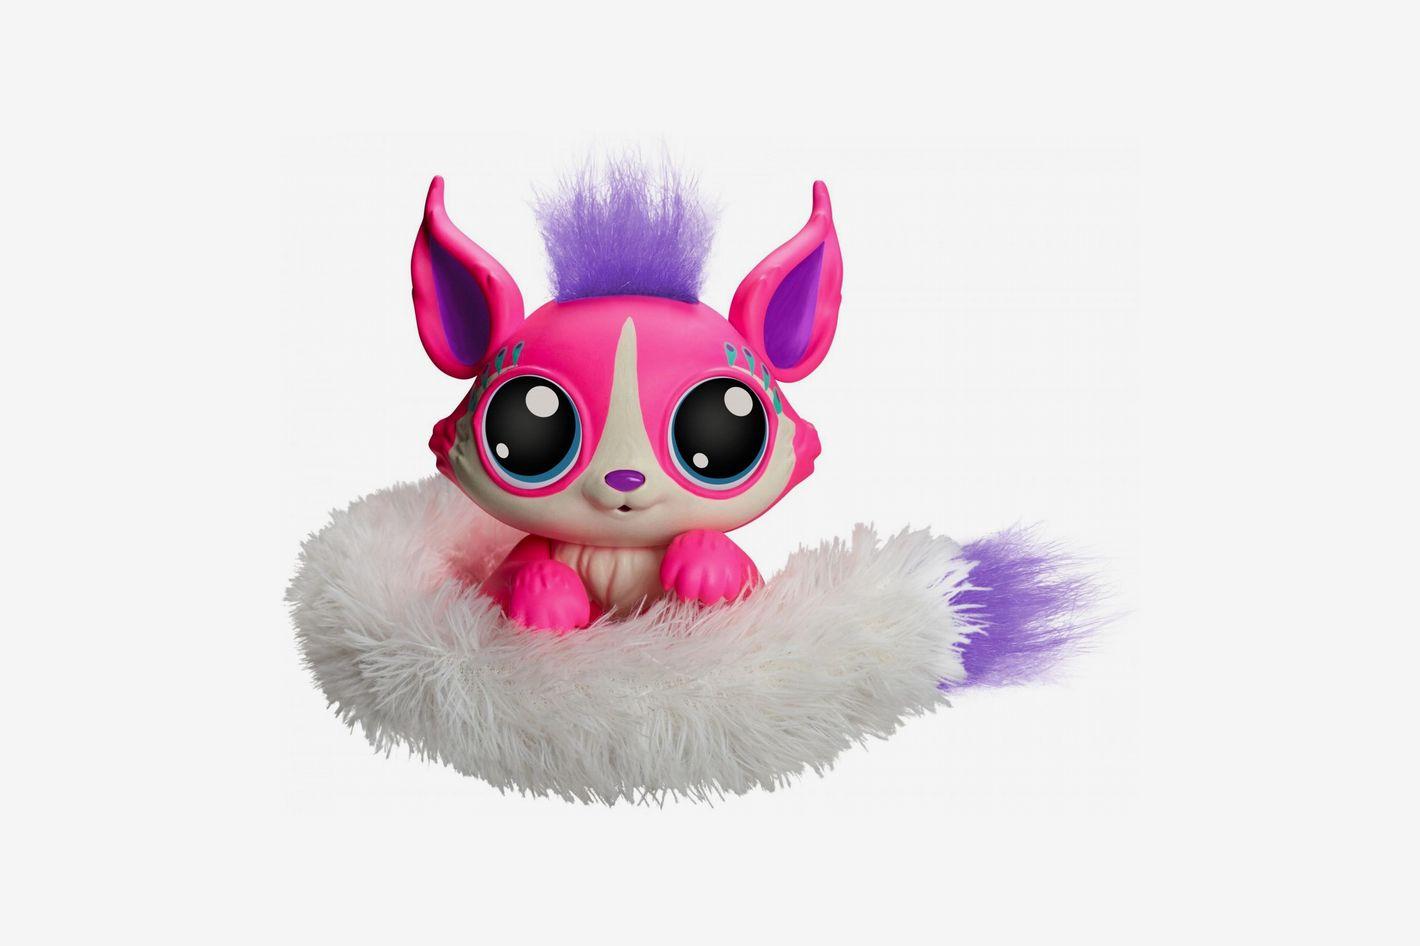 Lil' Gleemerz Adorbrite Furry Friend, Light Up Interactive Talking Toy